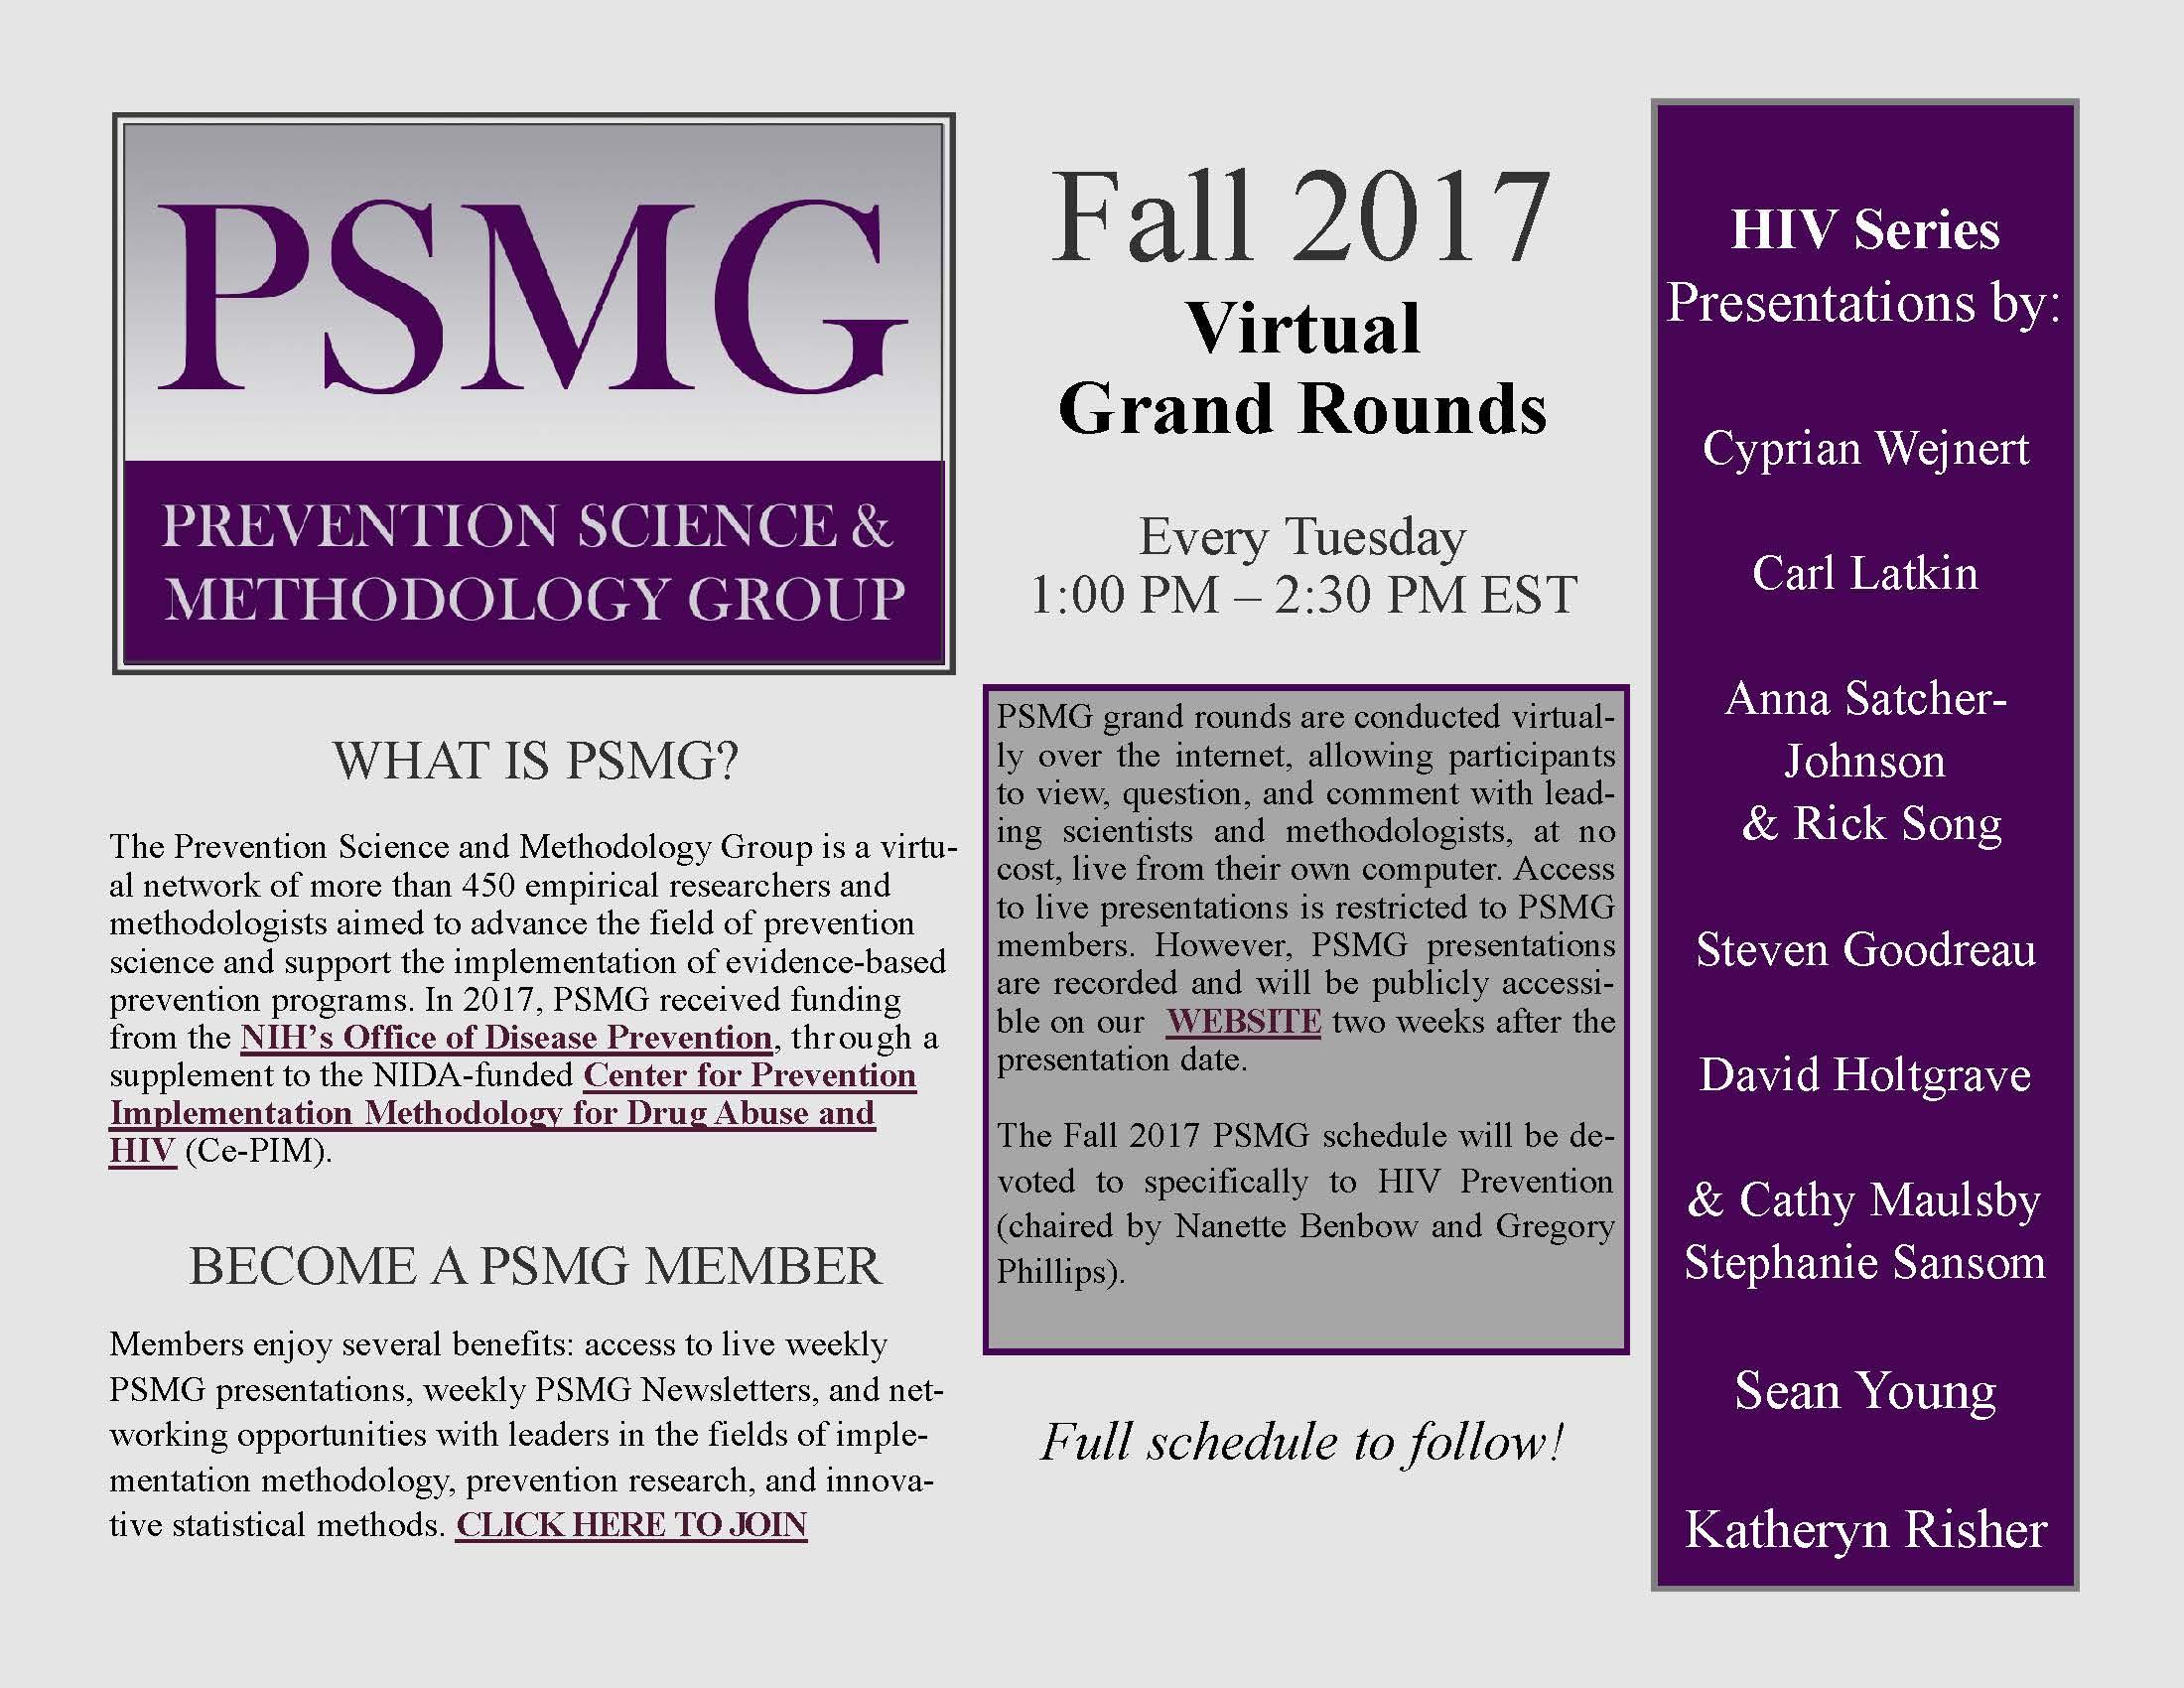 Informational flier for PSMG